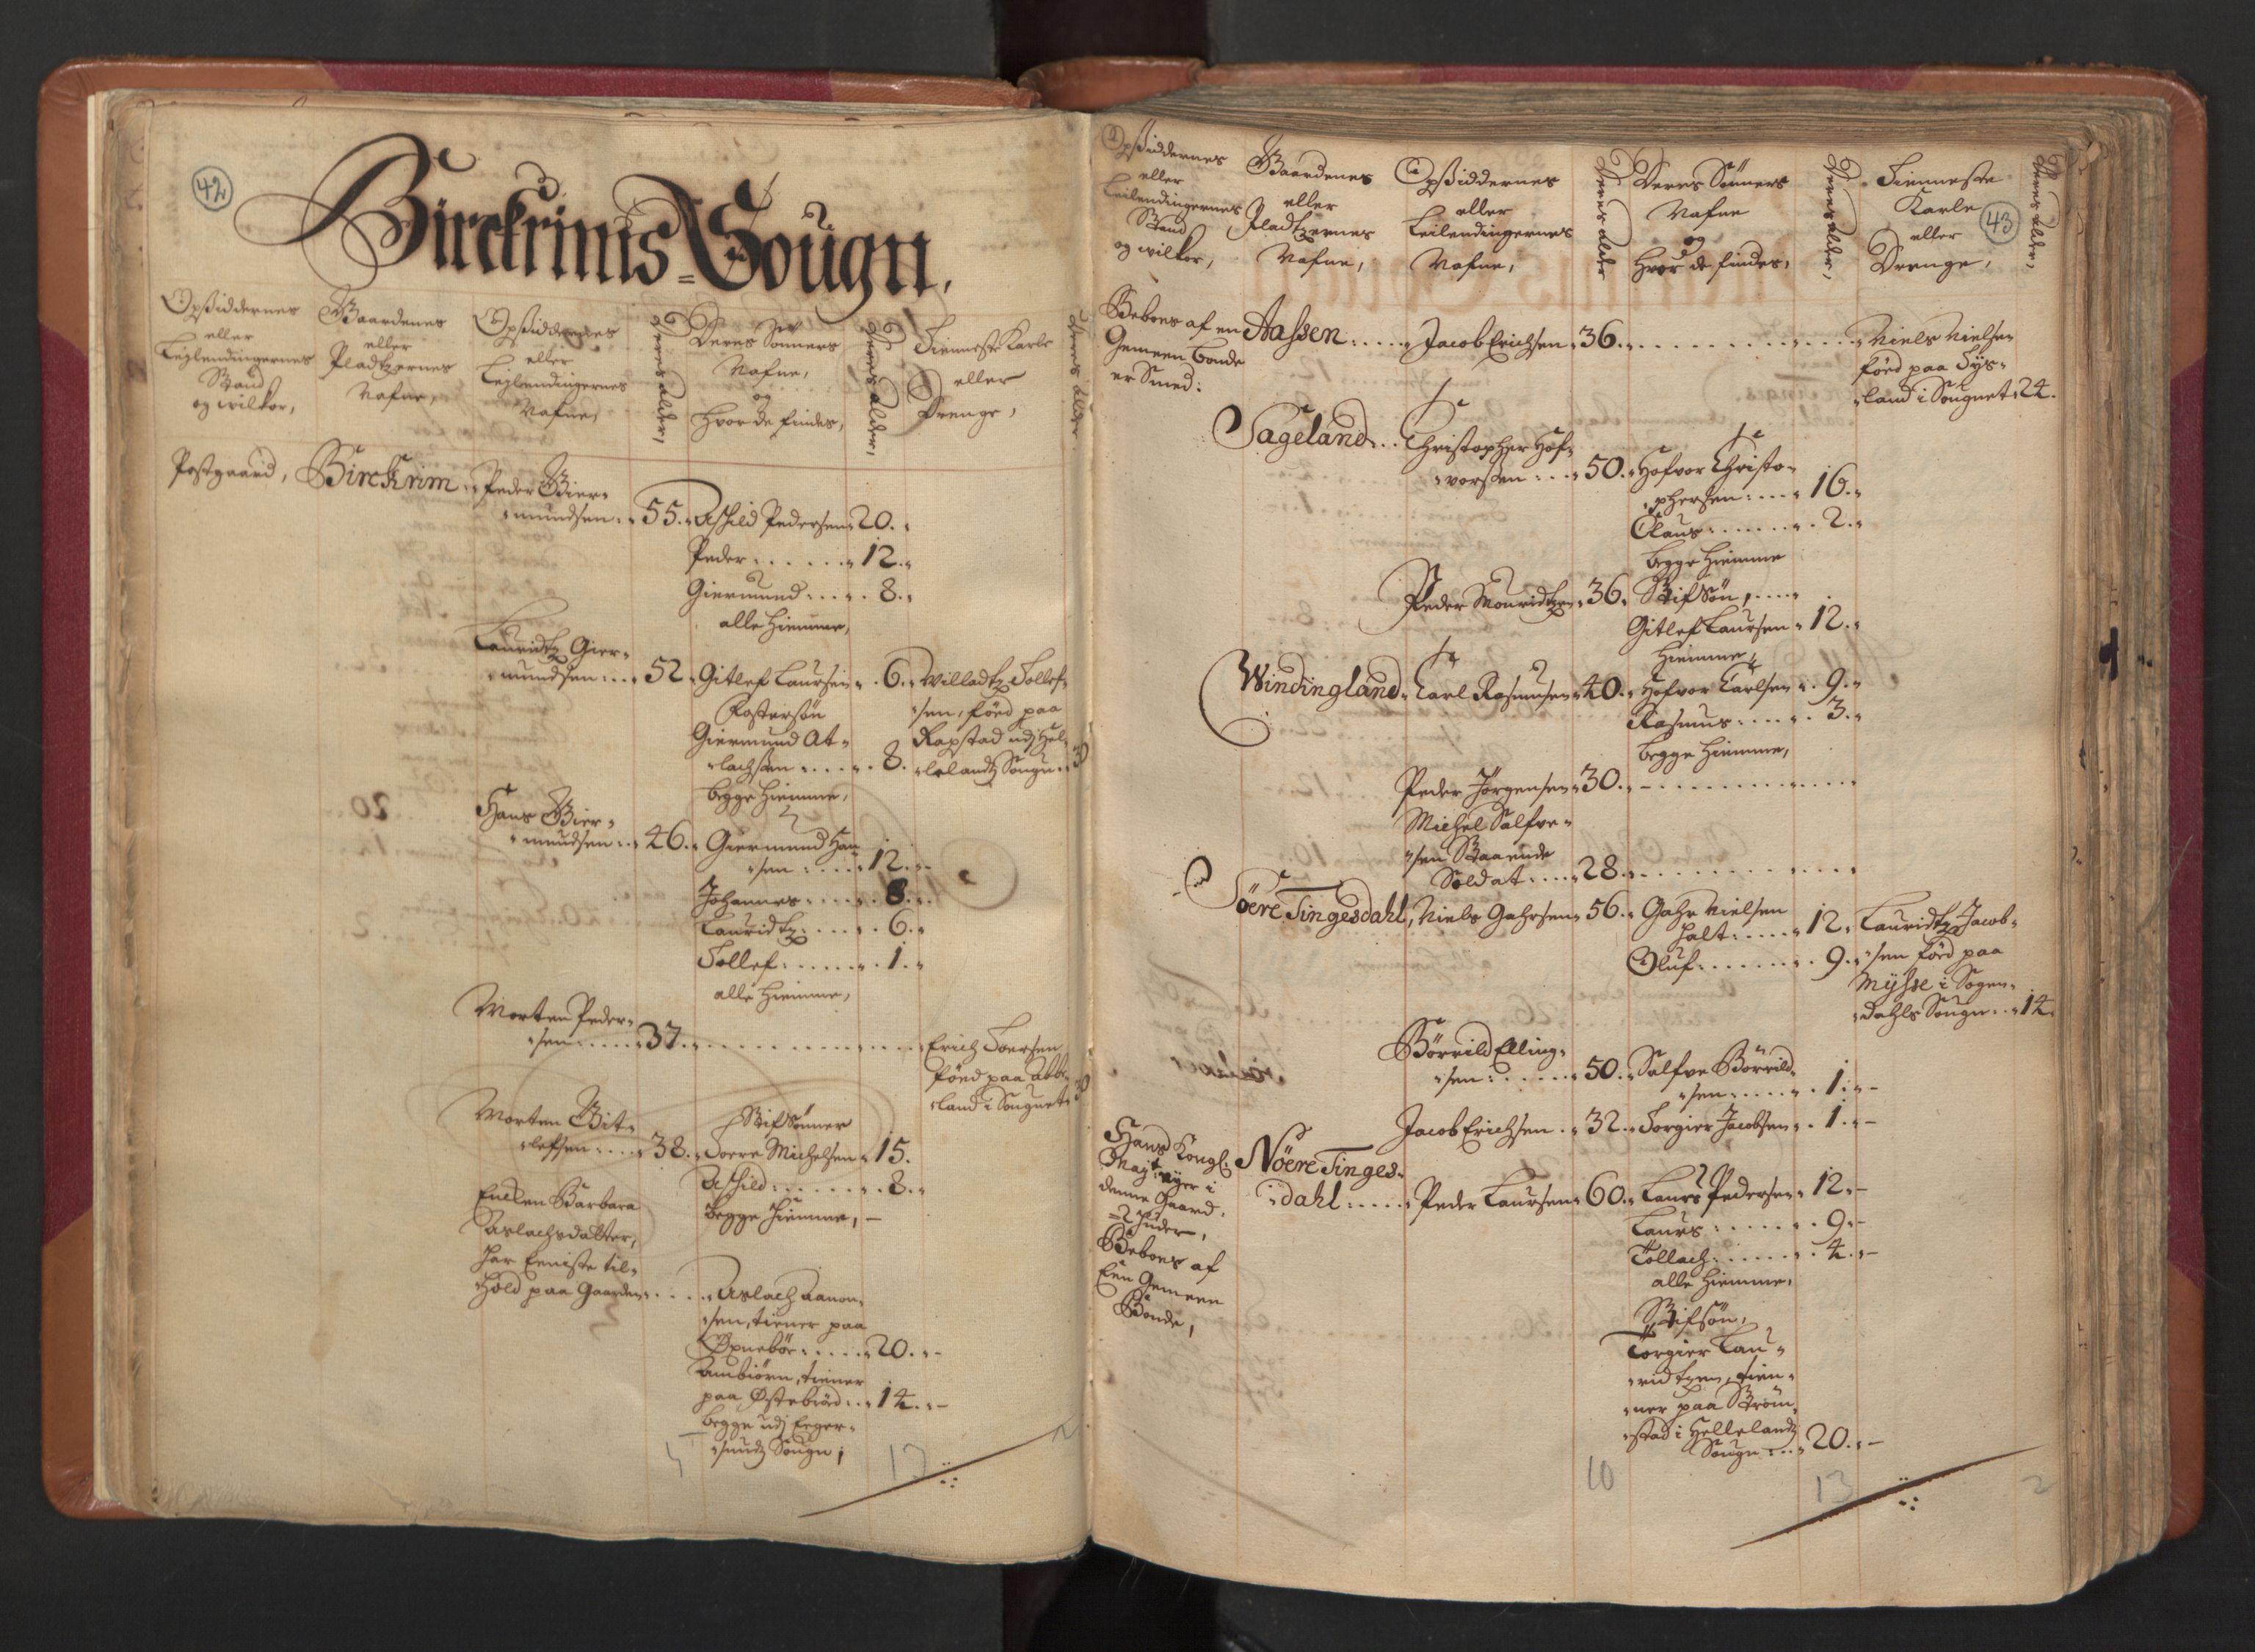 RA, Manntallet 1701, nr. 4: Jæren og Dalane fogderi, 1701, s. 42-43